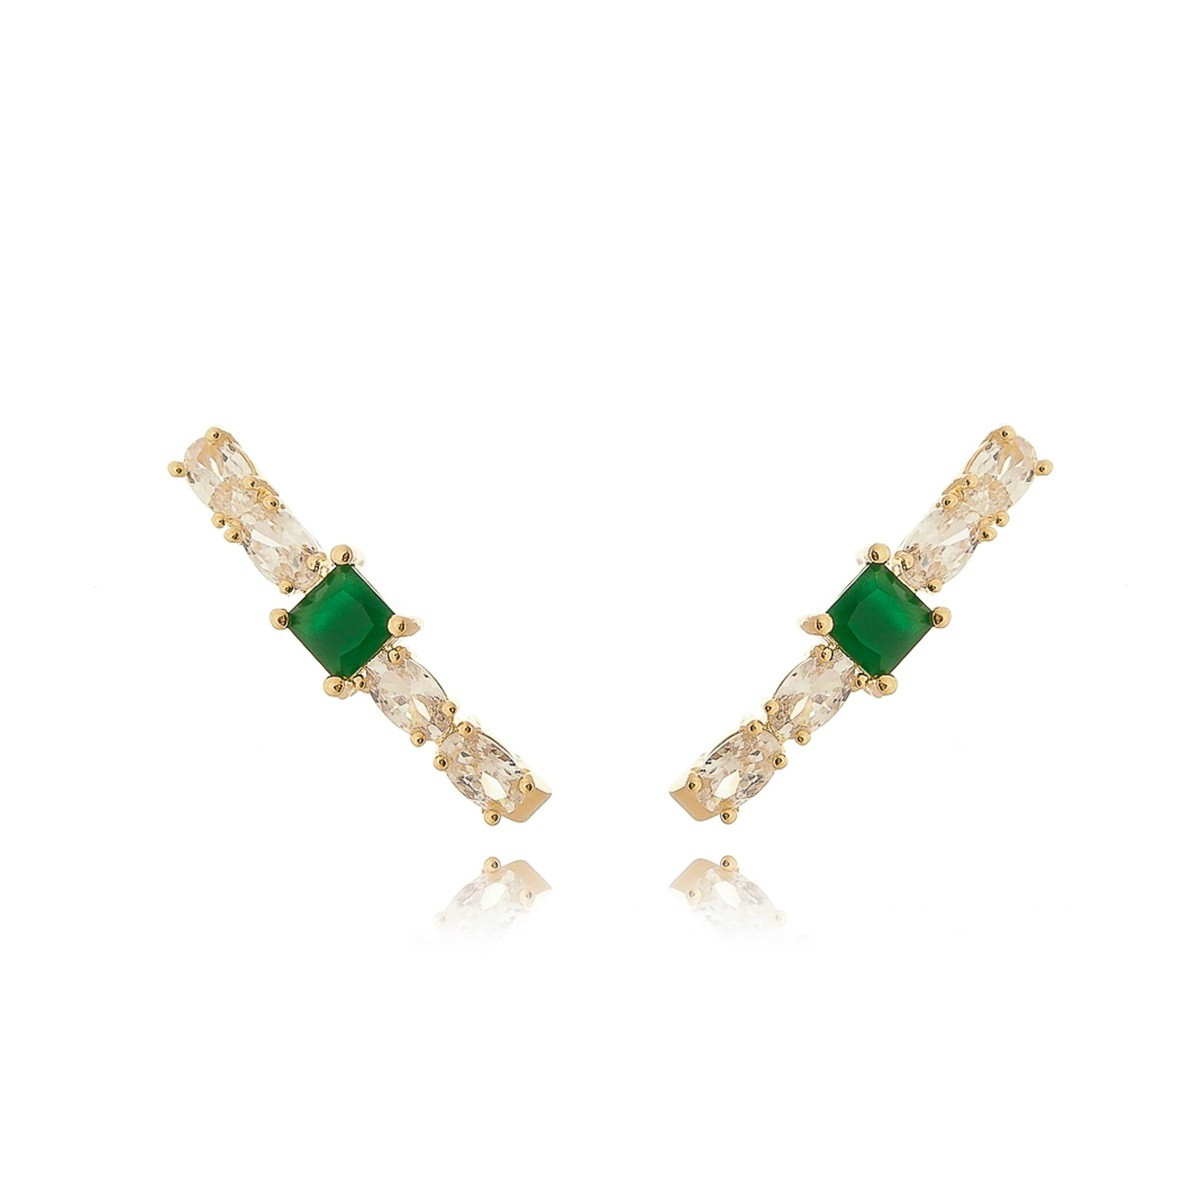 Ear Hook Moda de Zircônia Oval Branca Brilhante e Esmeralda Semijoia em Ouro 18K  - Soloyou